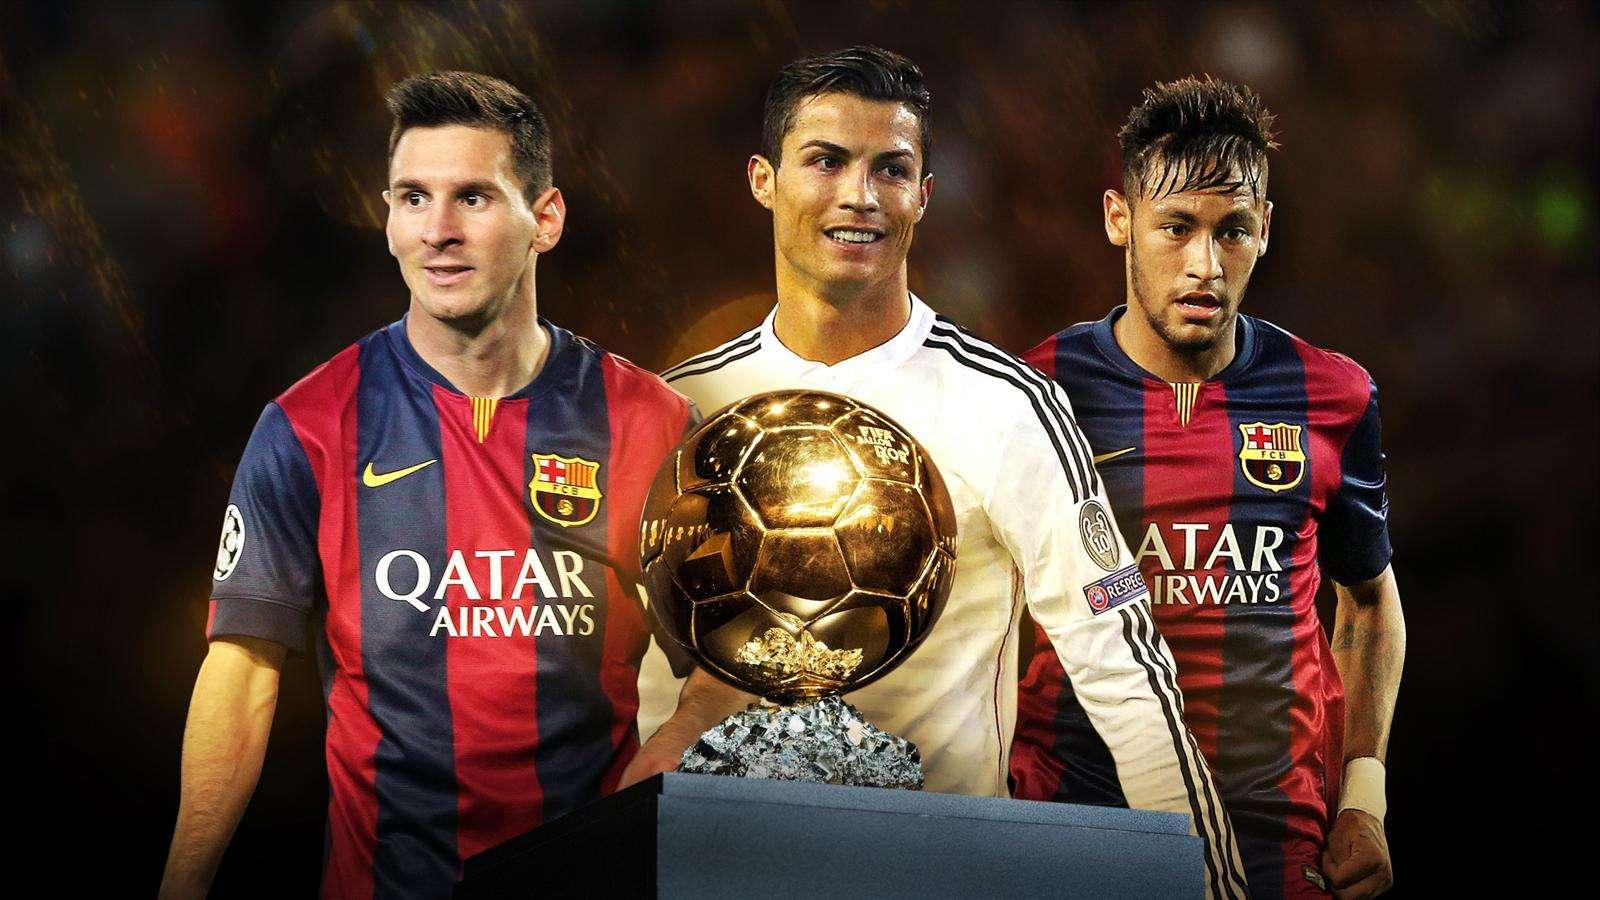 جائزة Fifa Ballon D'or 2015